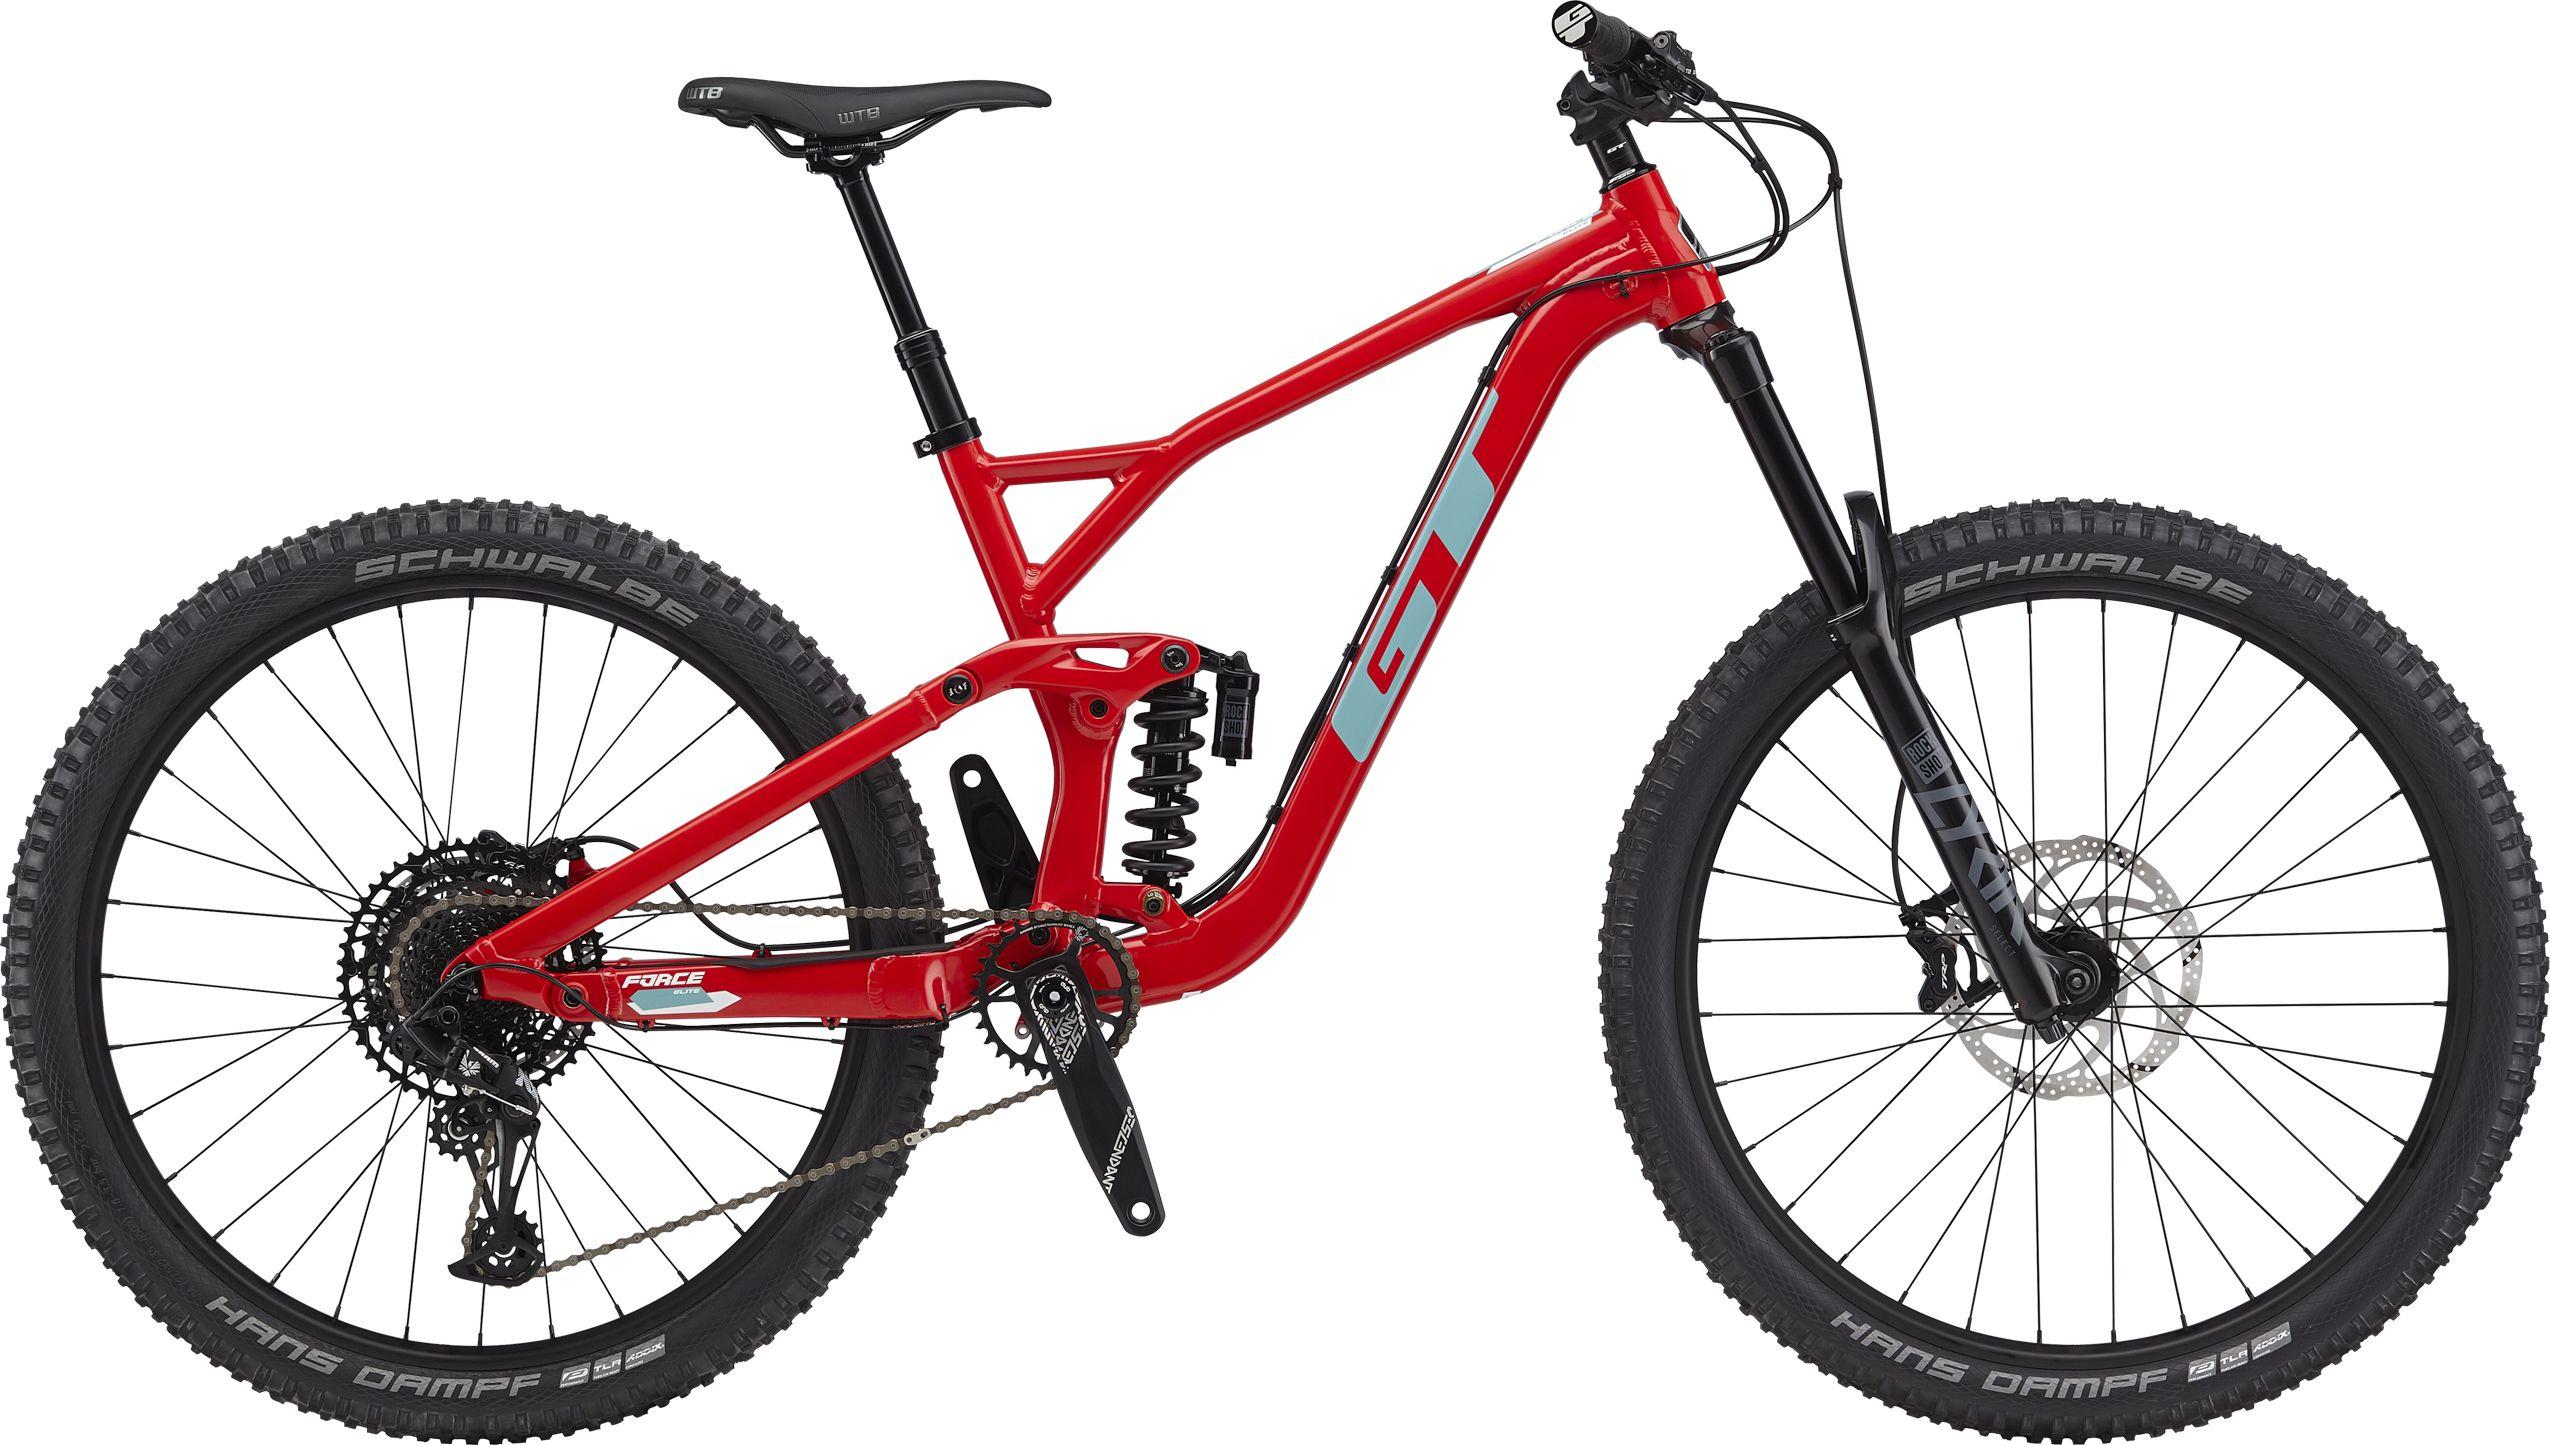 Cyclestore co uk